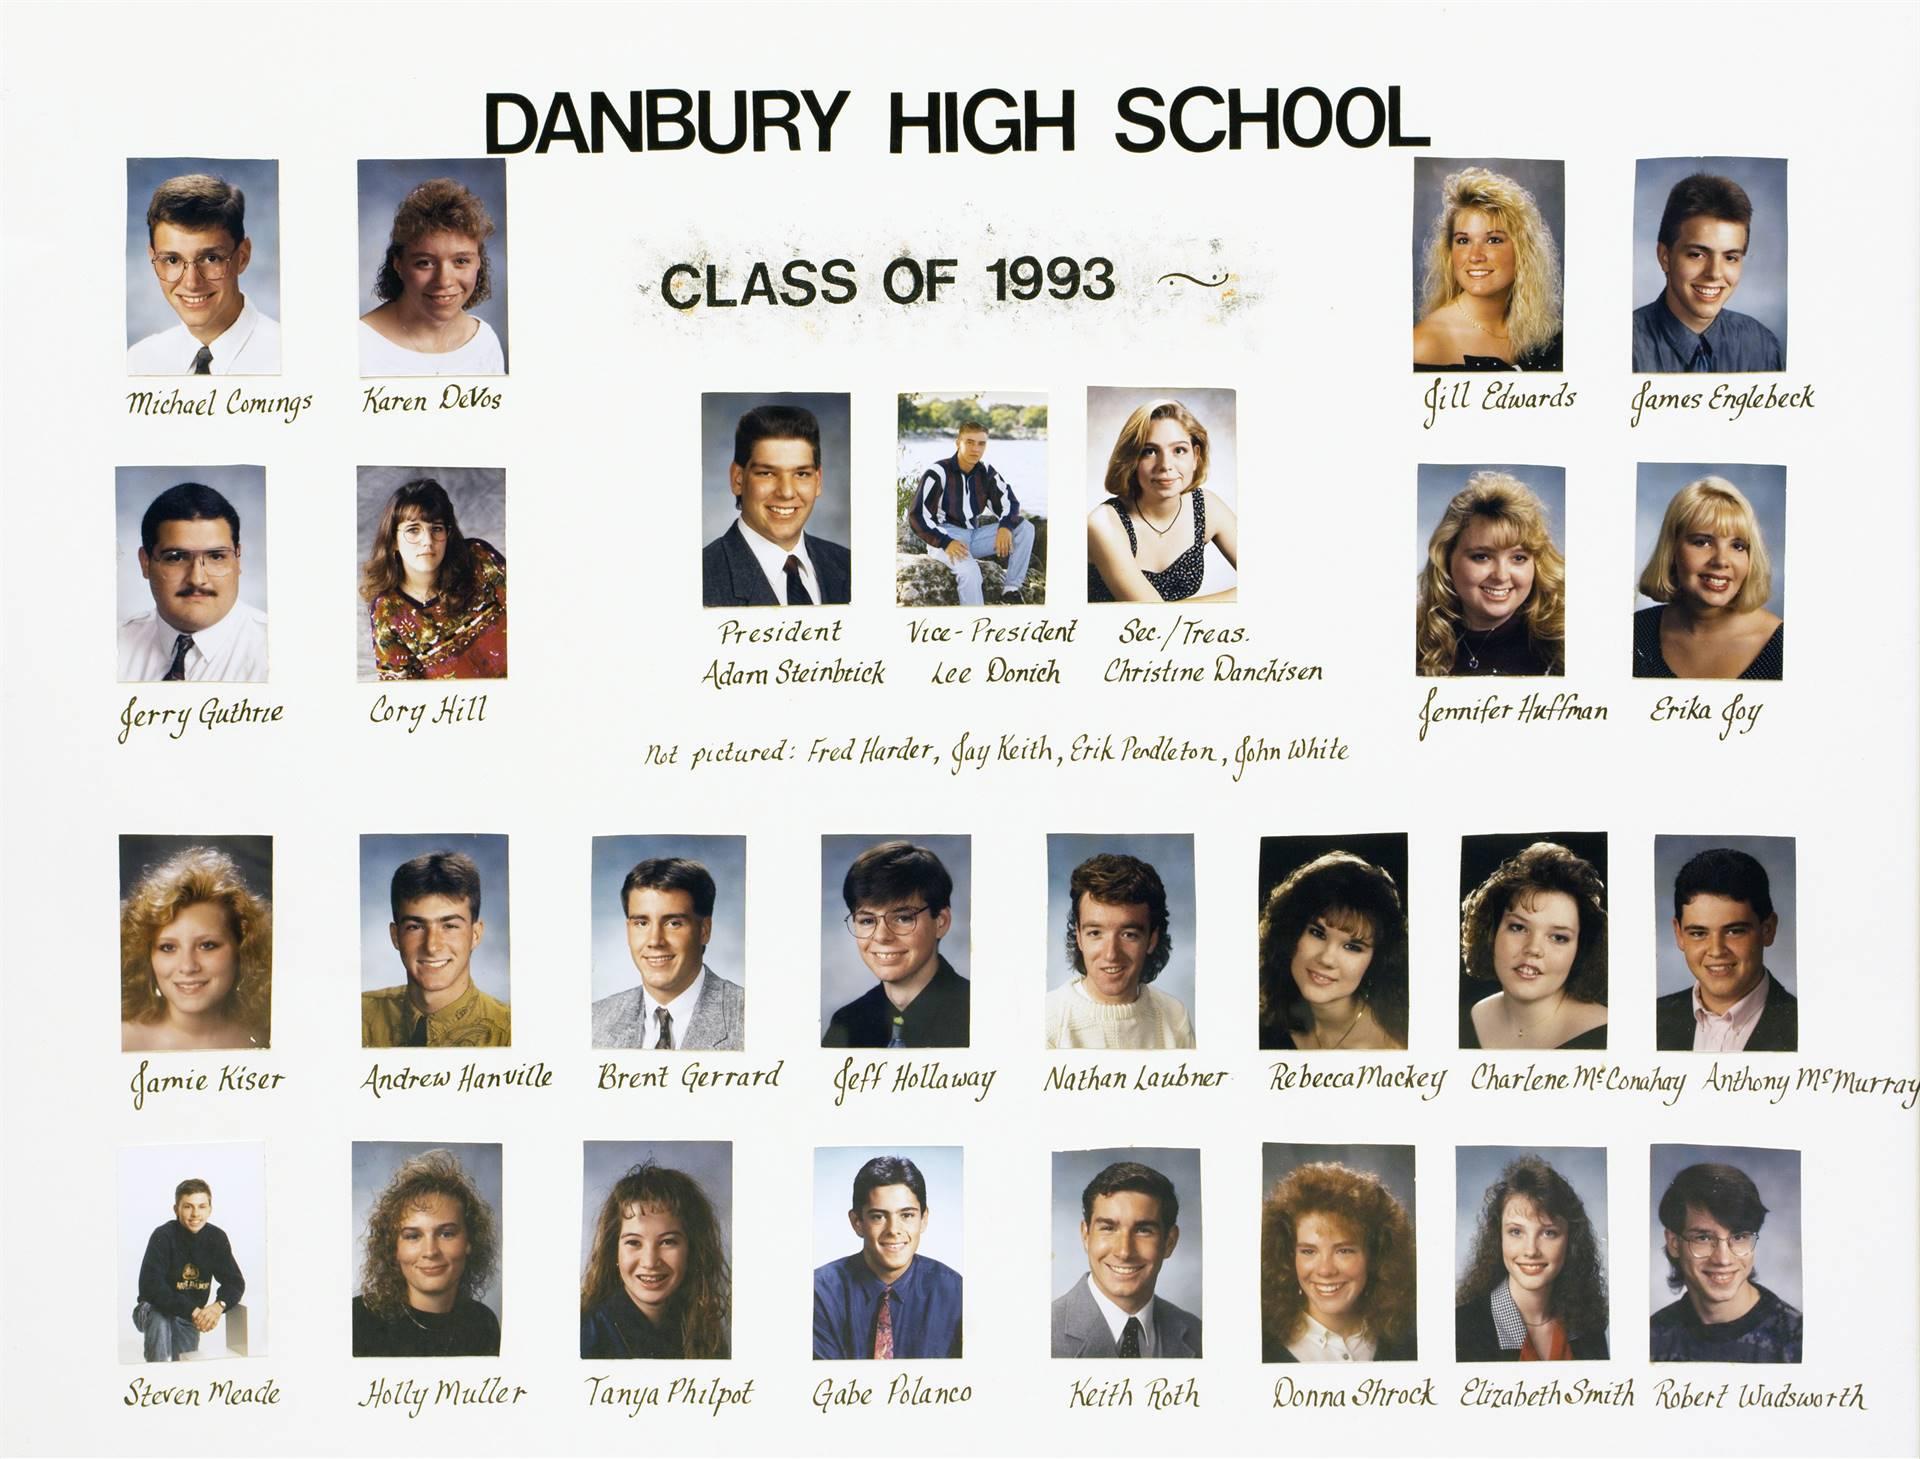 Class of 1993